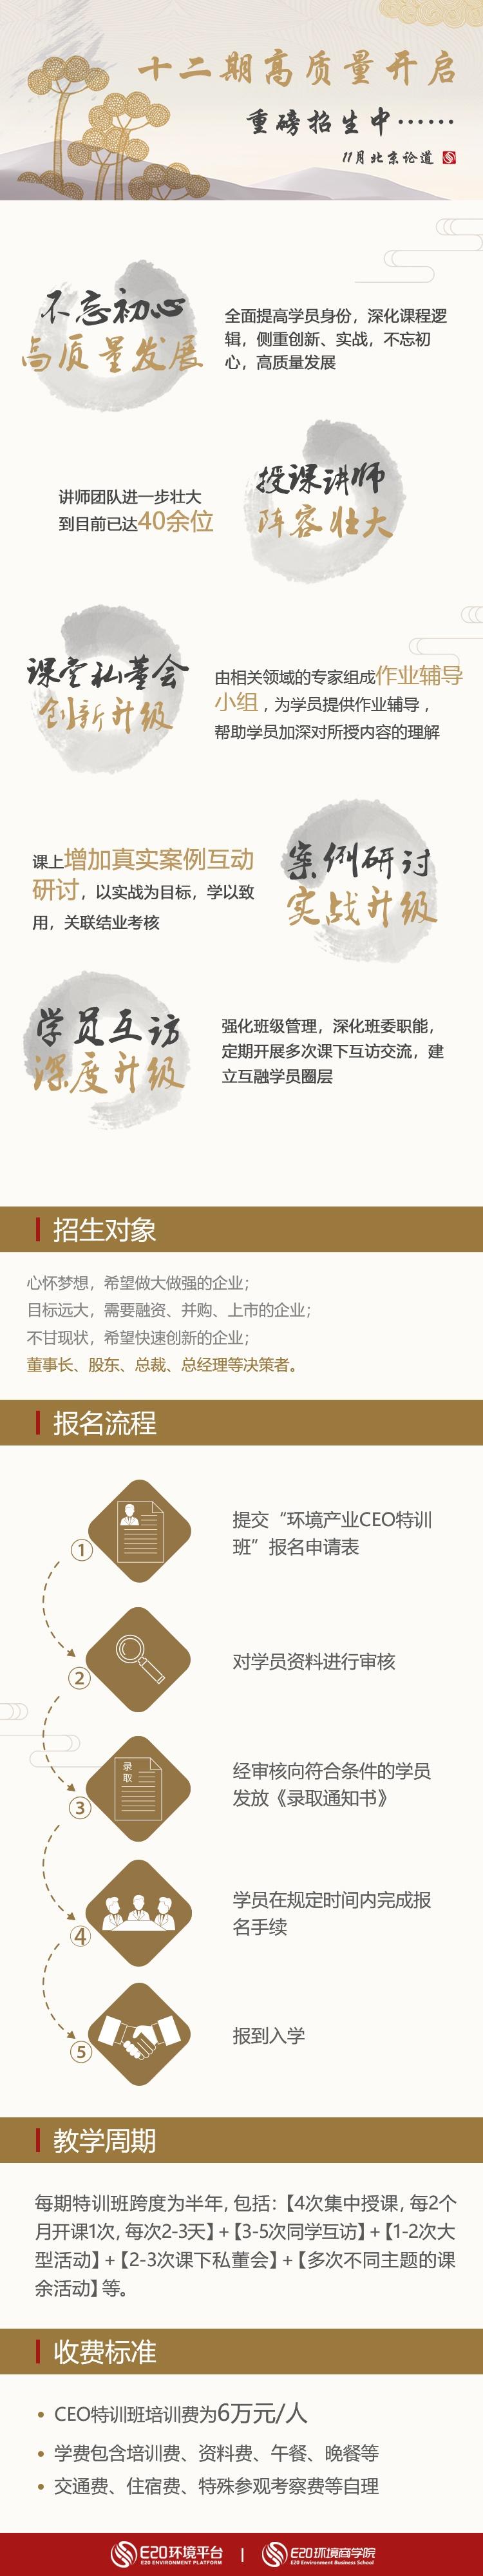 CEO特训班微官网-3.jpg